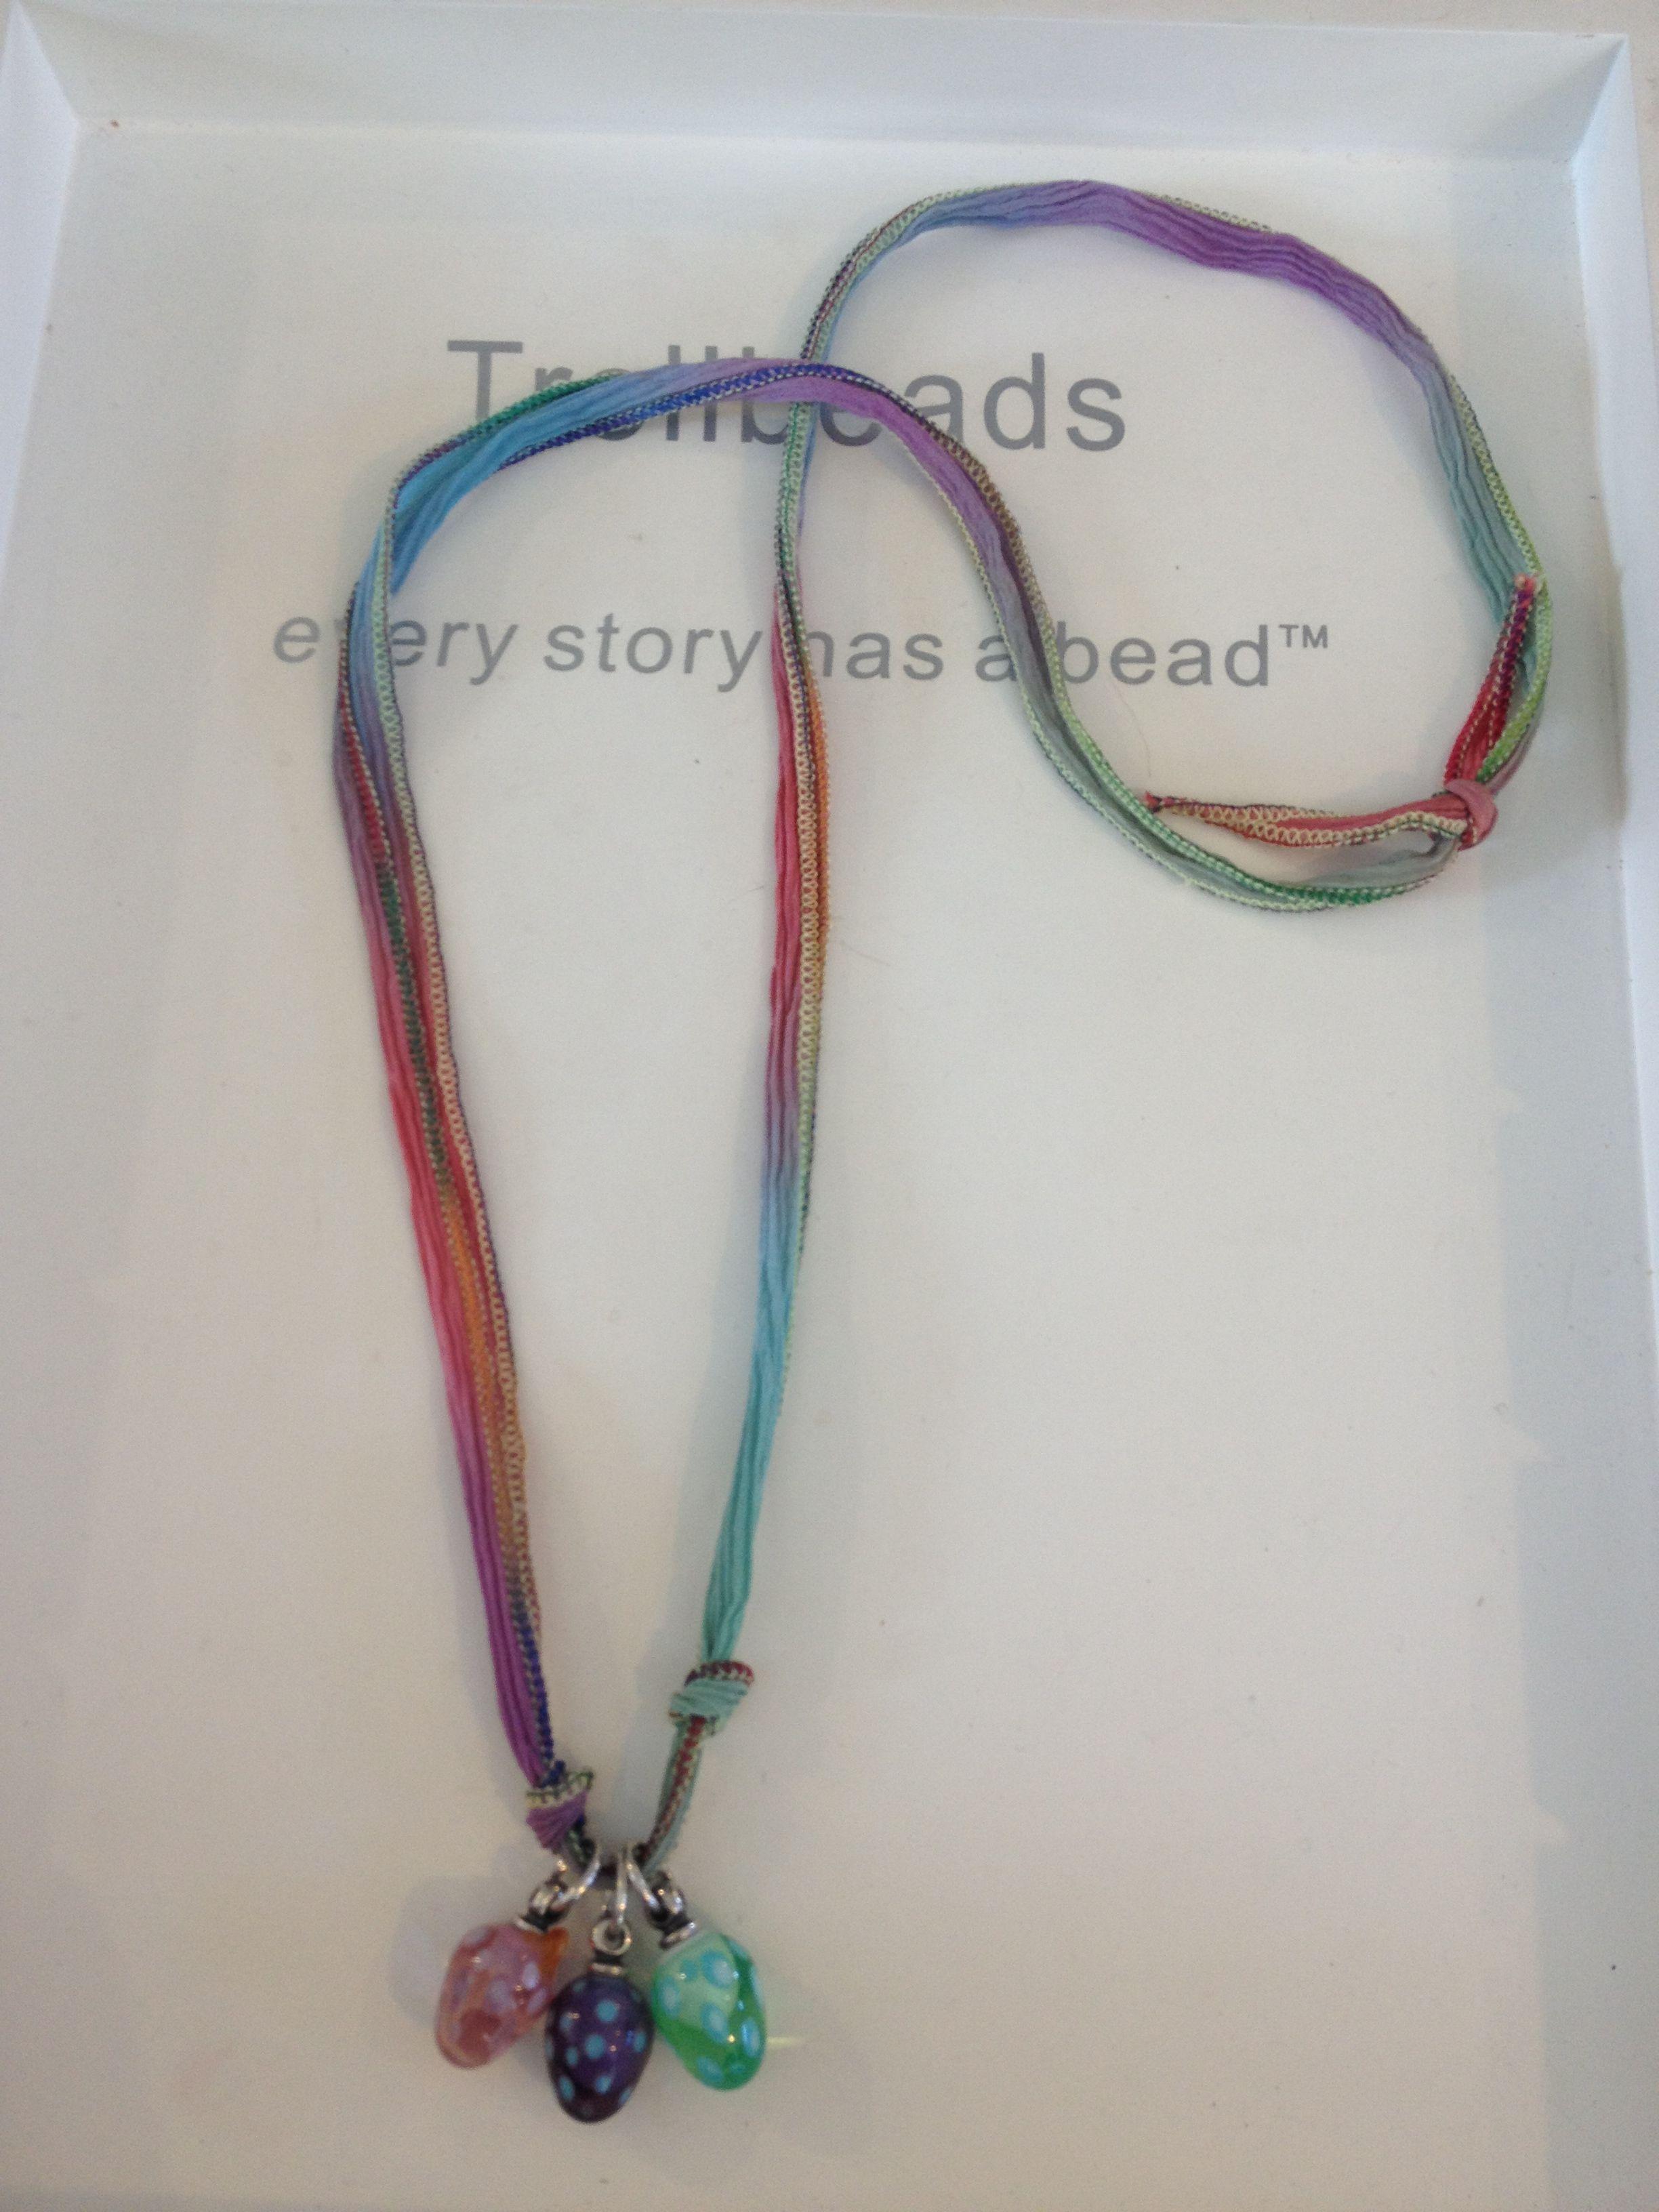 Such a pretty way to wear a few highlight beads!